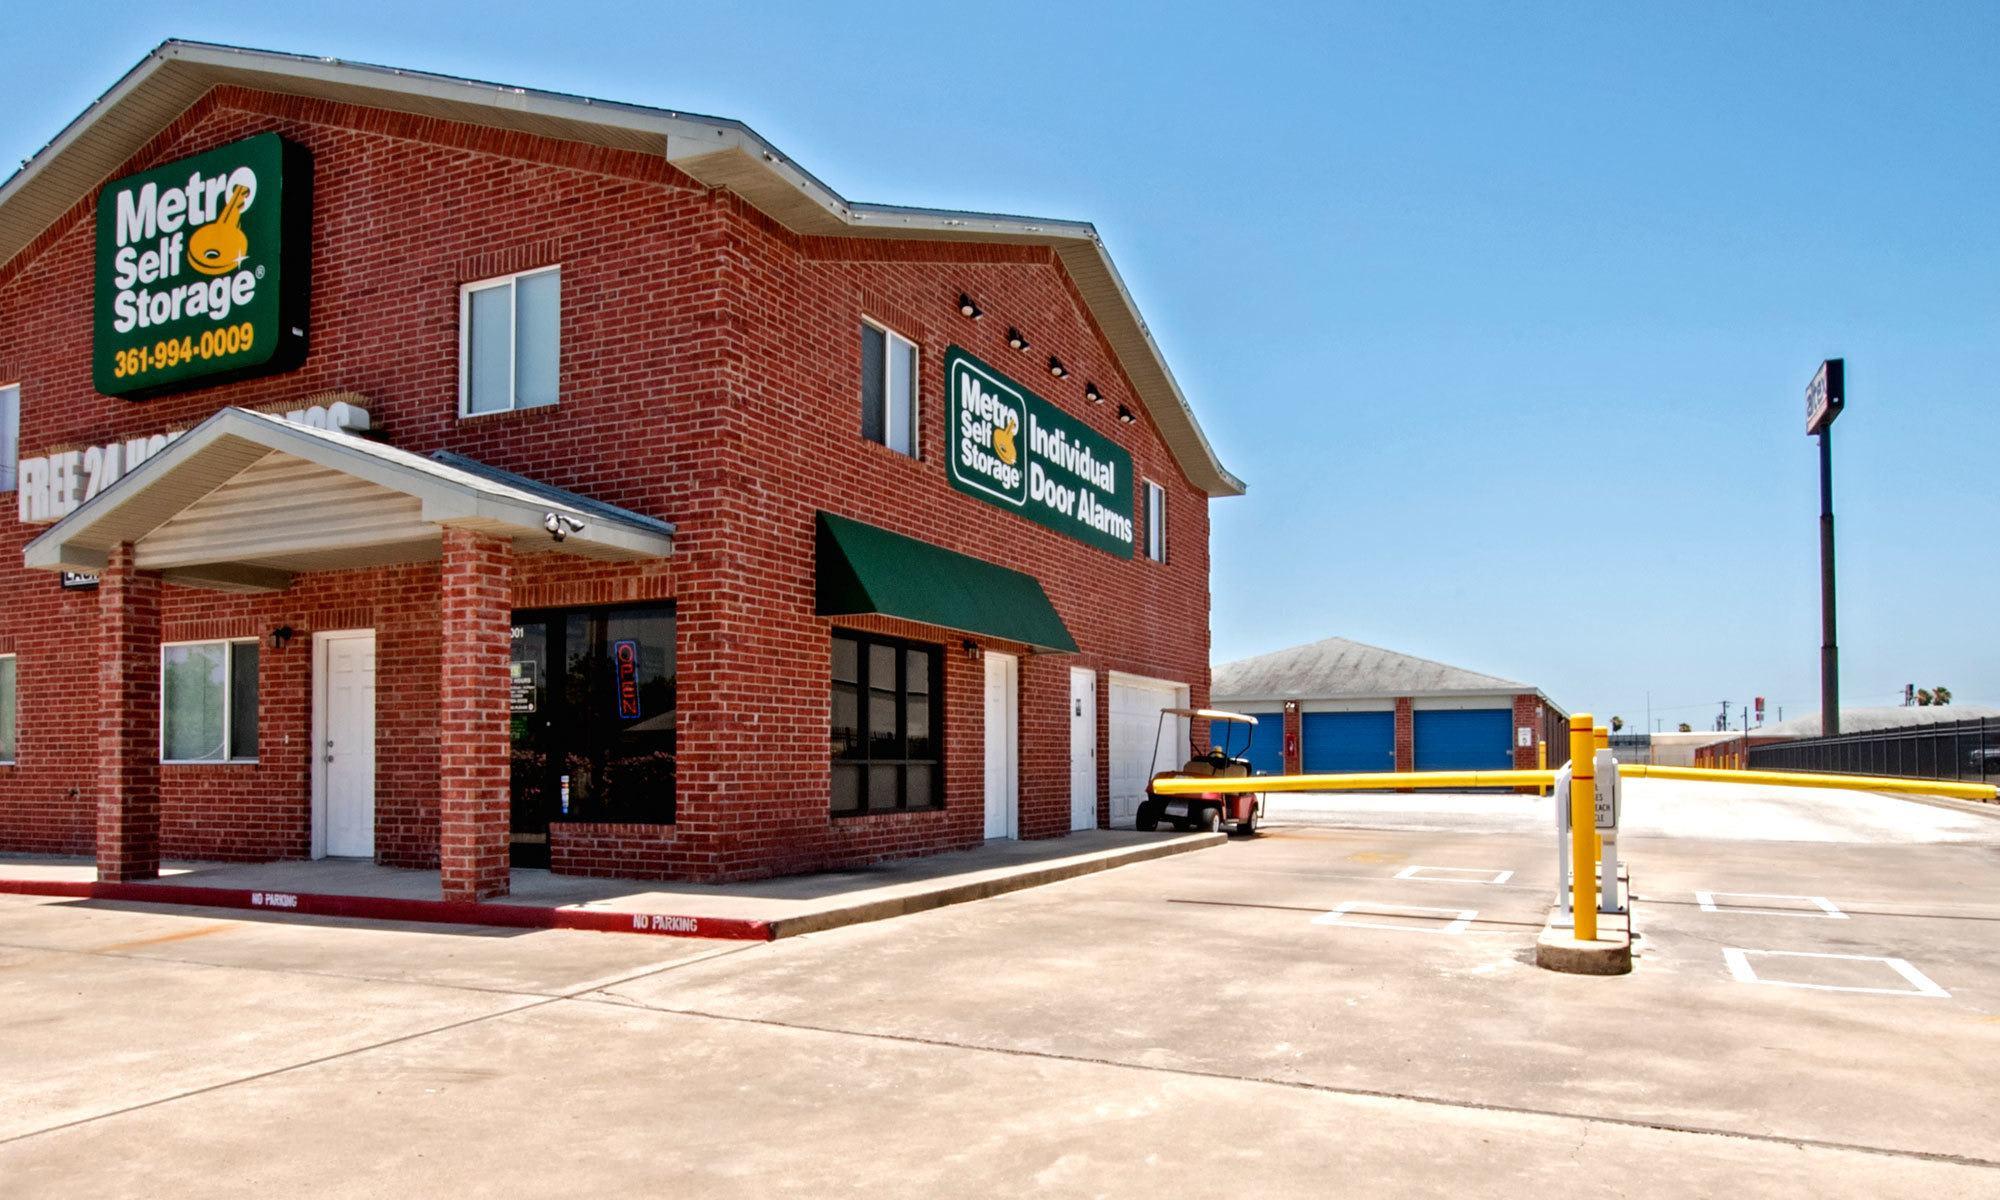 Metro Self Storage in Corpus Christi, TX